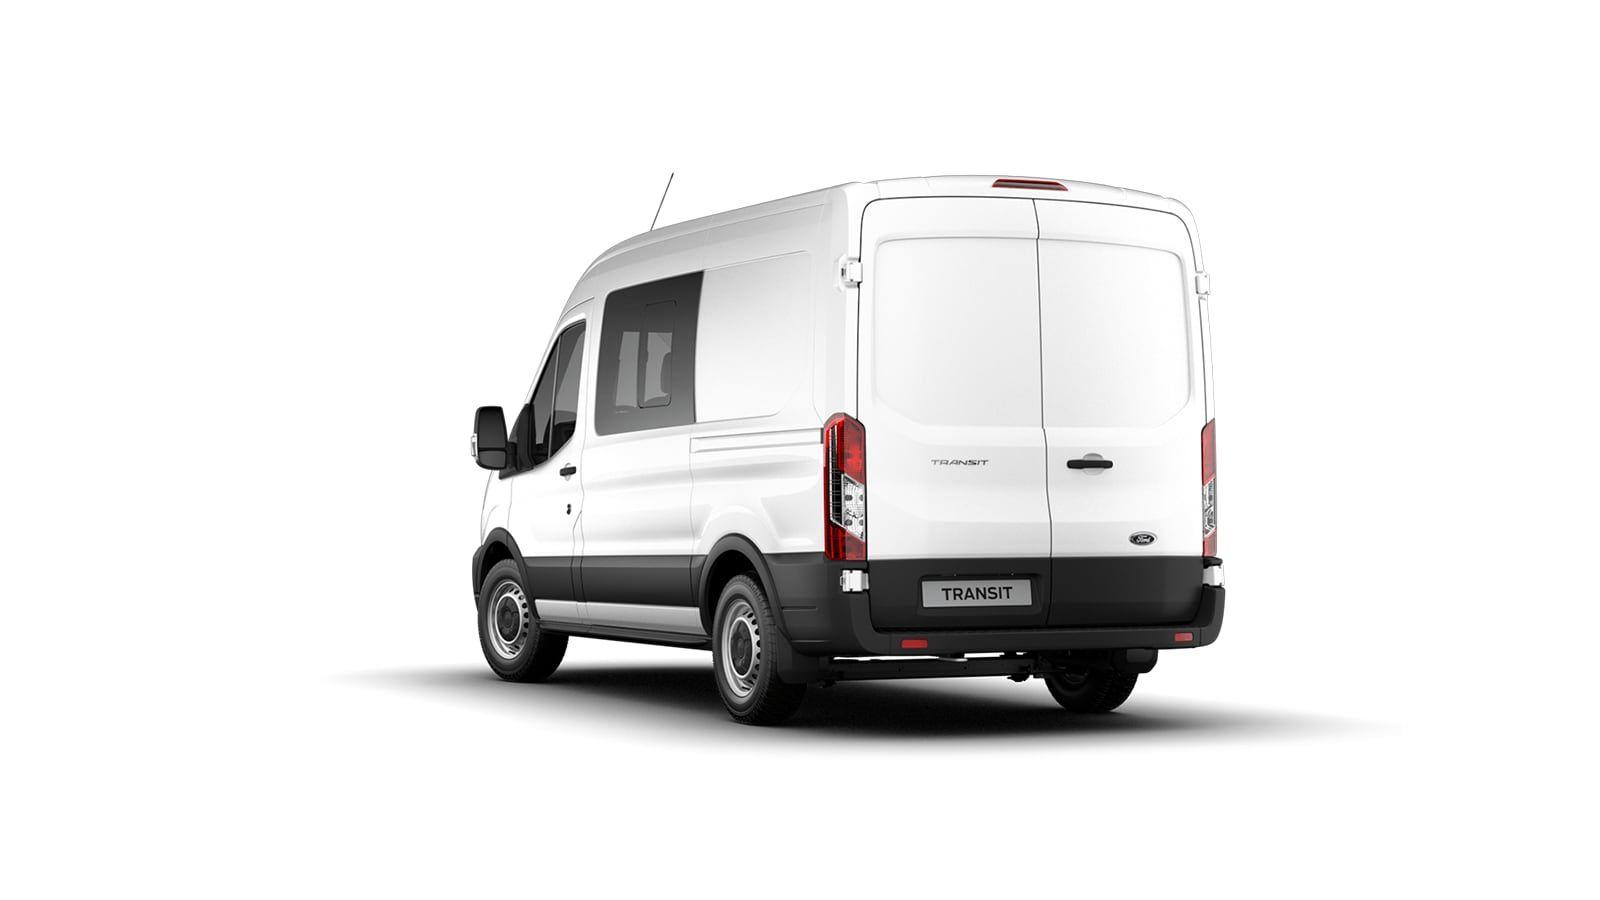 Nieuw Ford Transit 2t mca 350L Minibus L3 Trend mHEVM6 2.0 TD 130 pk M1 Euro 6.2 AXW - niet-metaalkleur: Frozen White 3